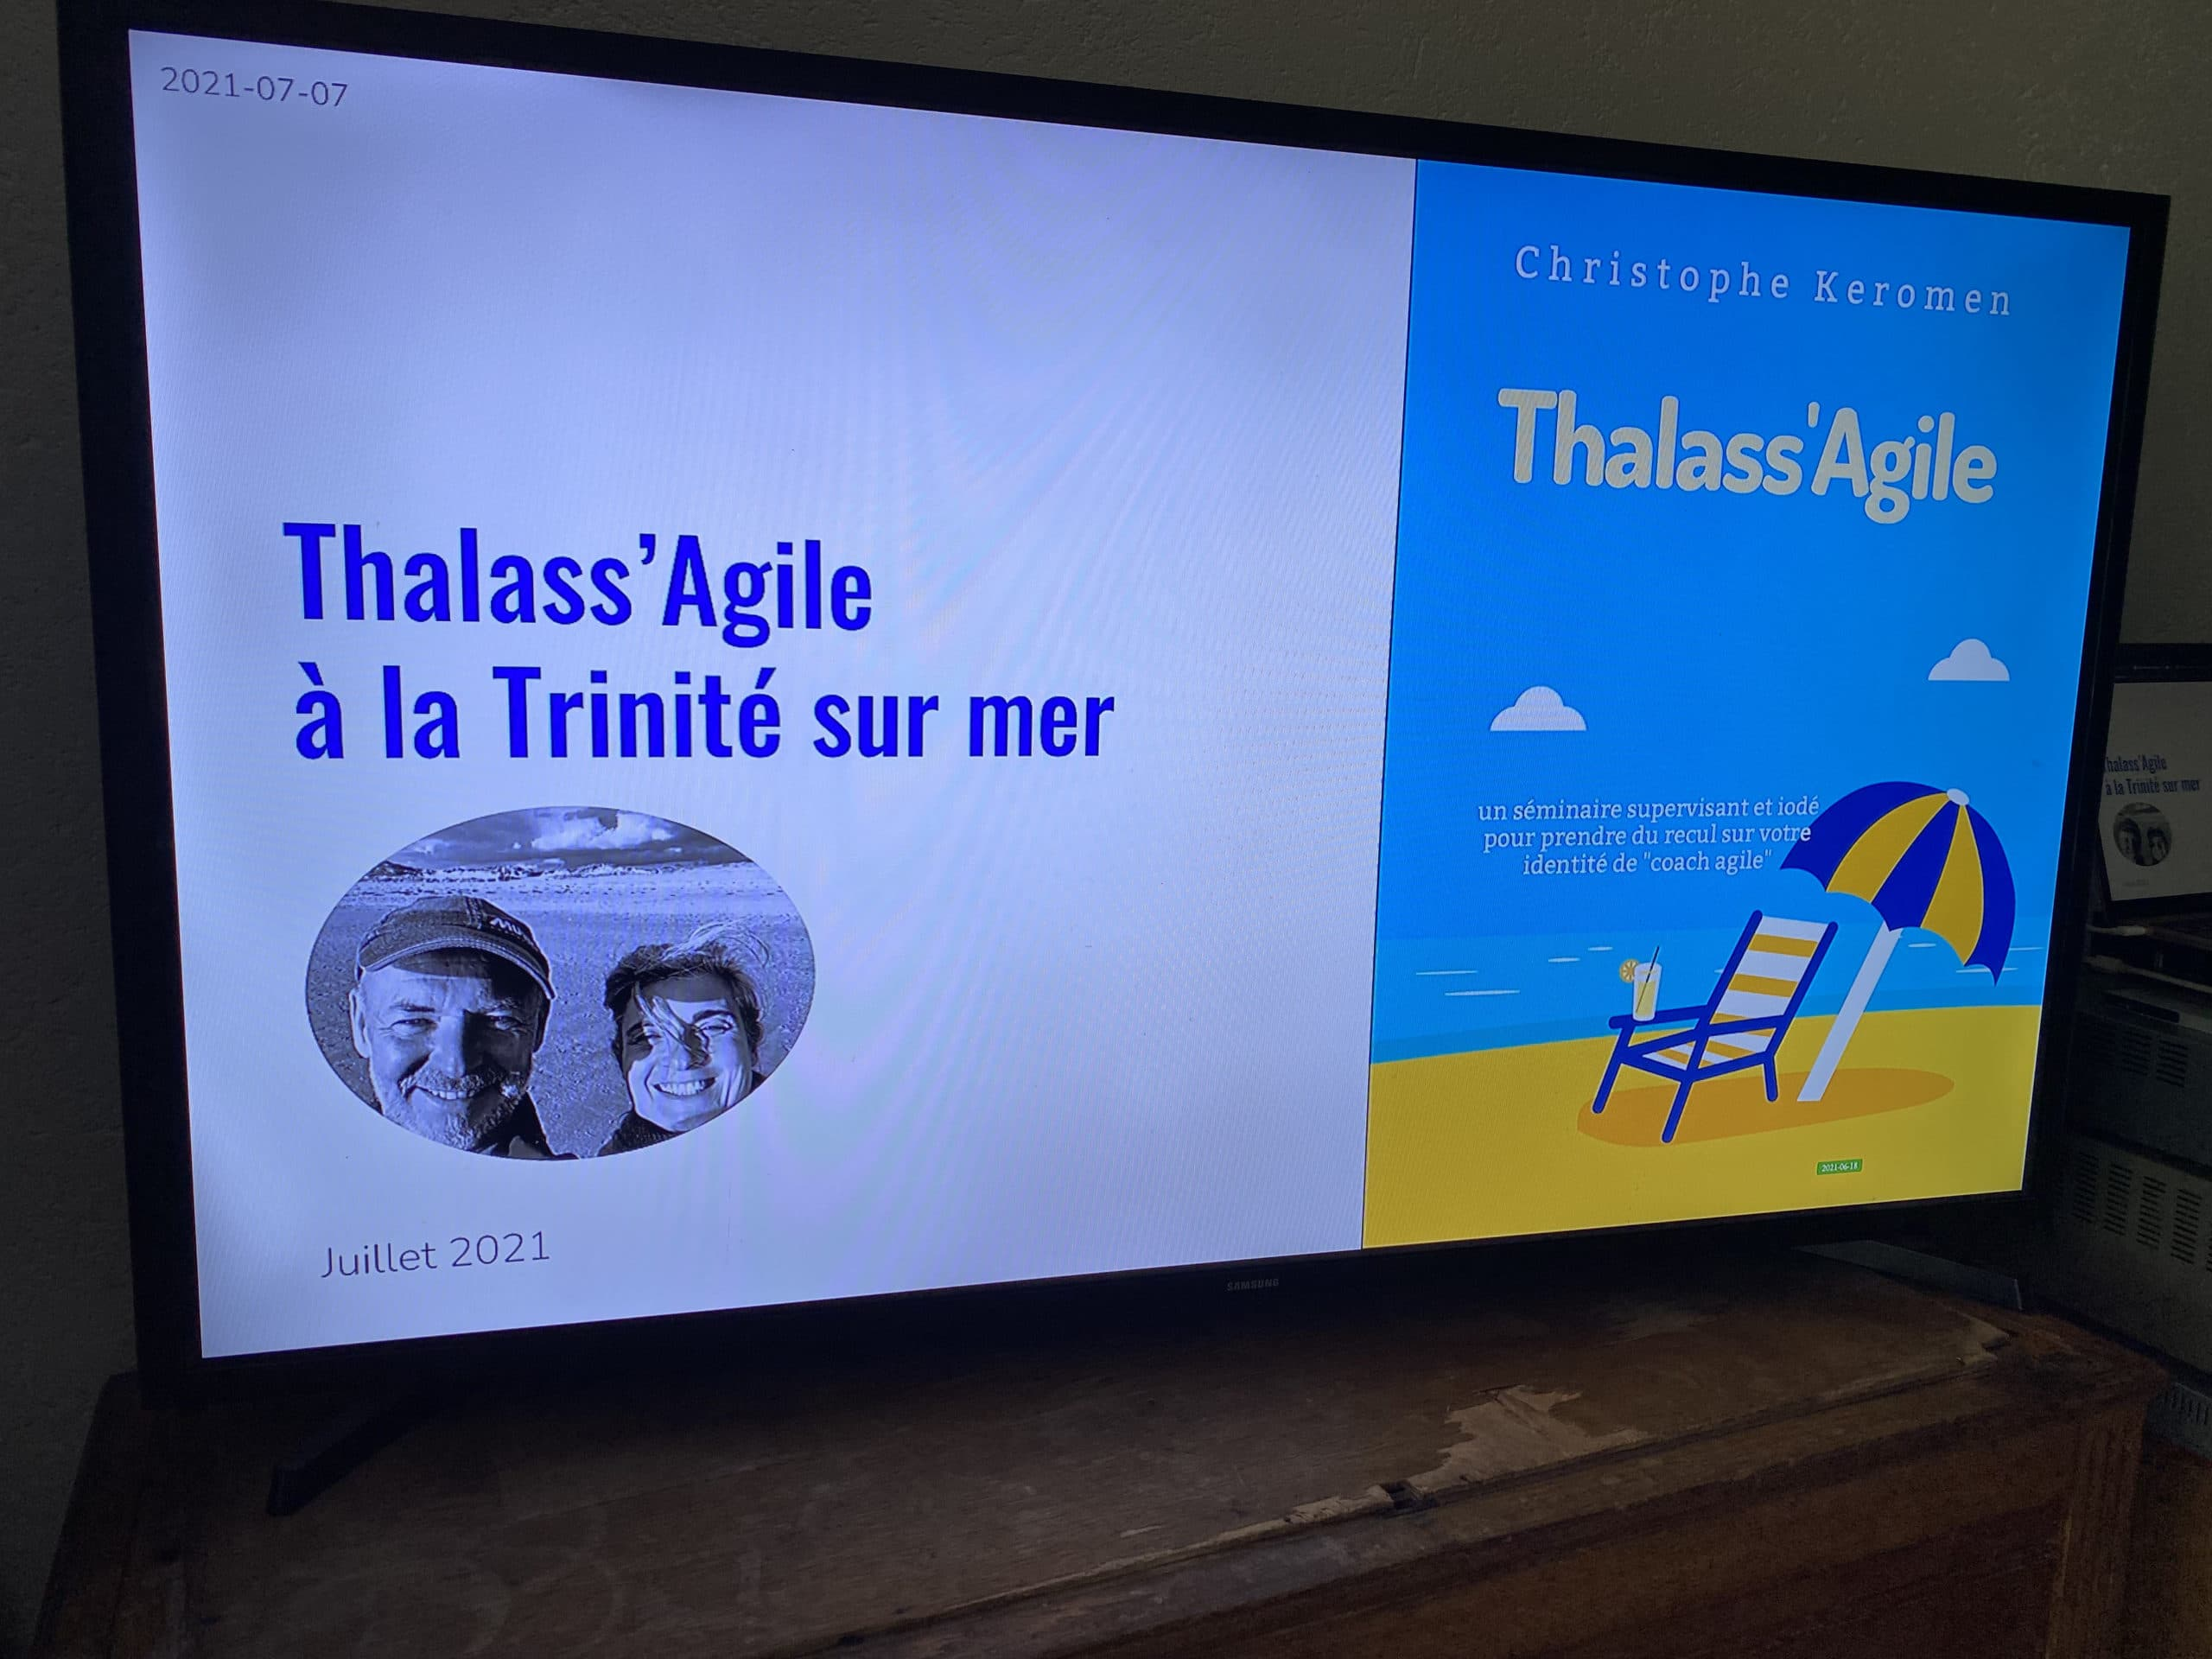 Thalassagile